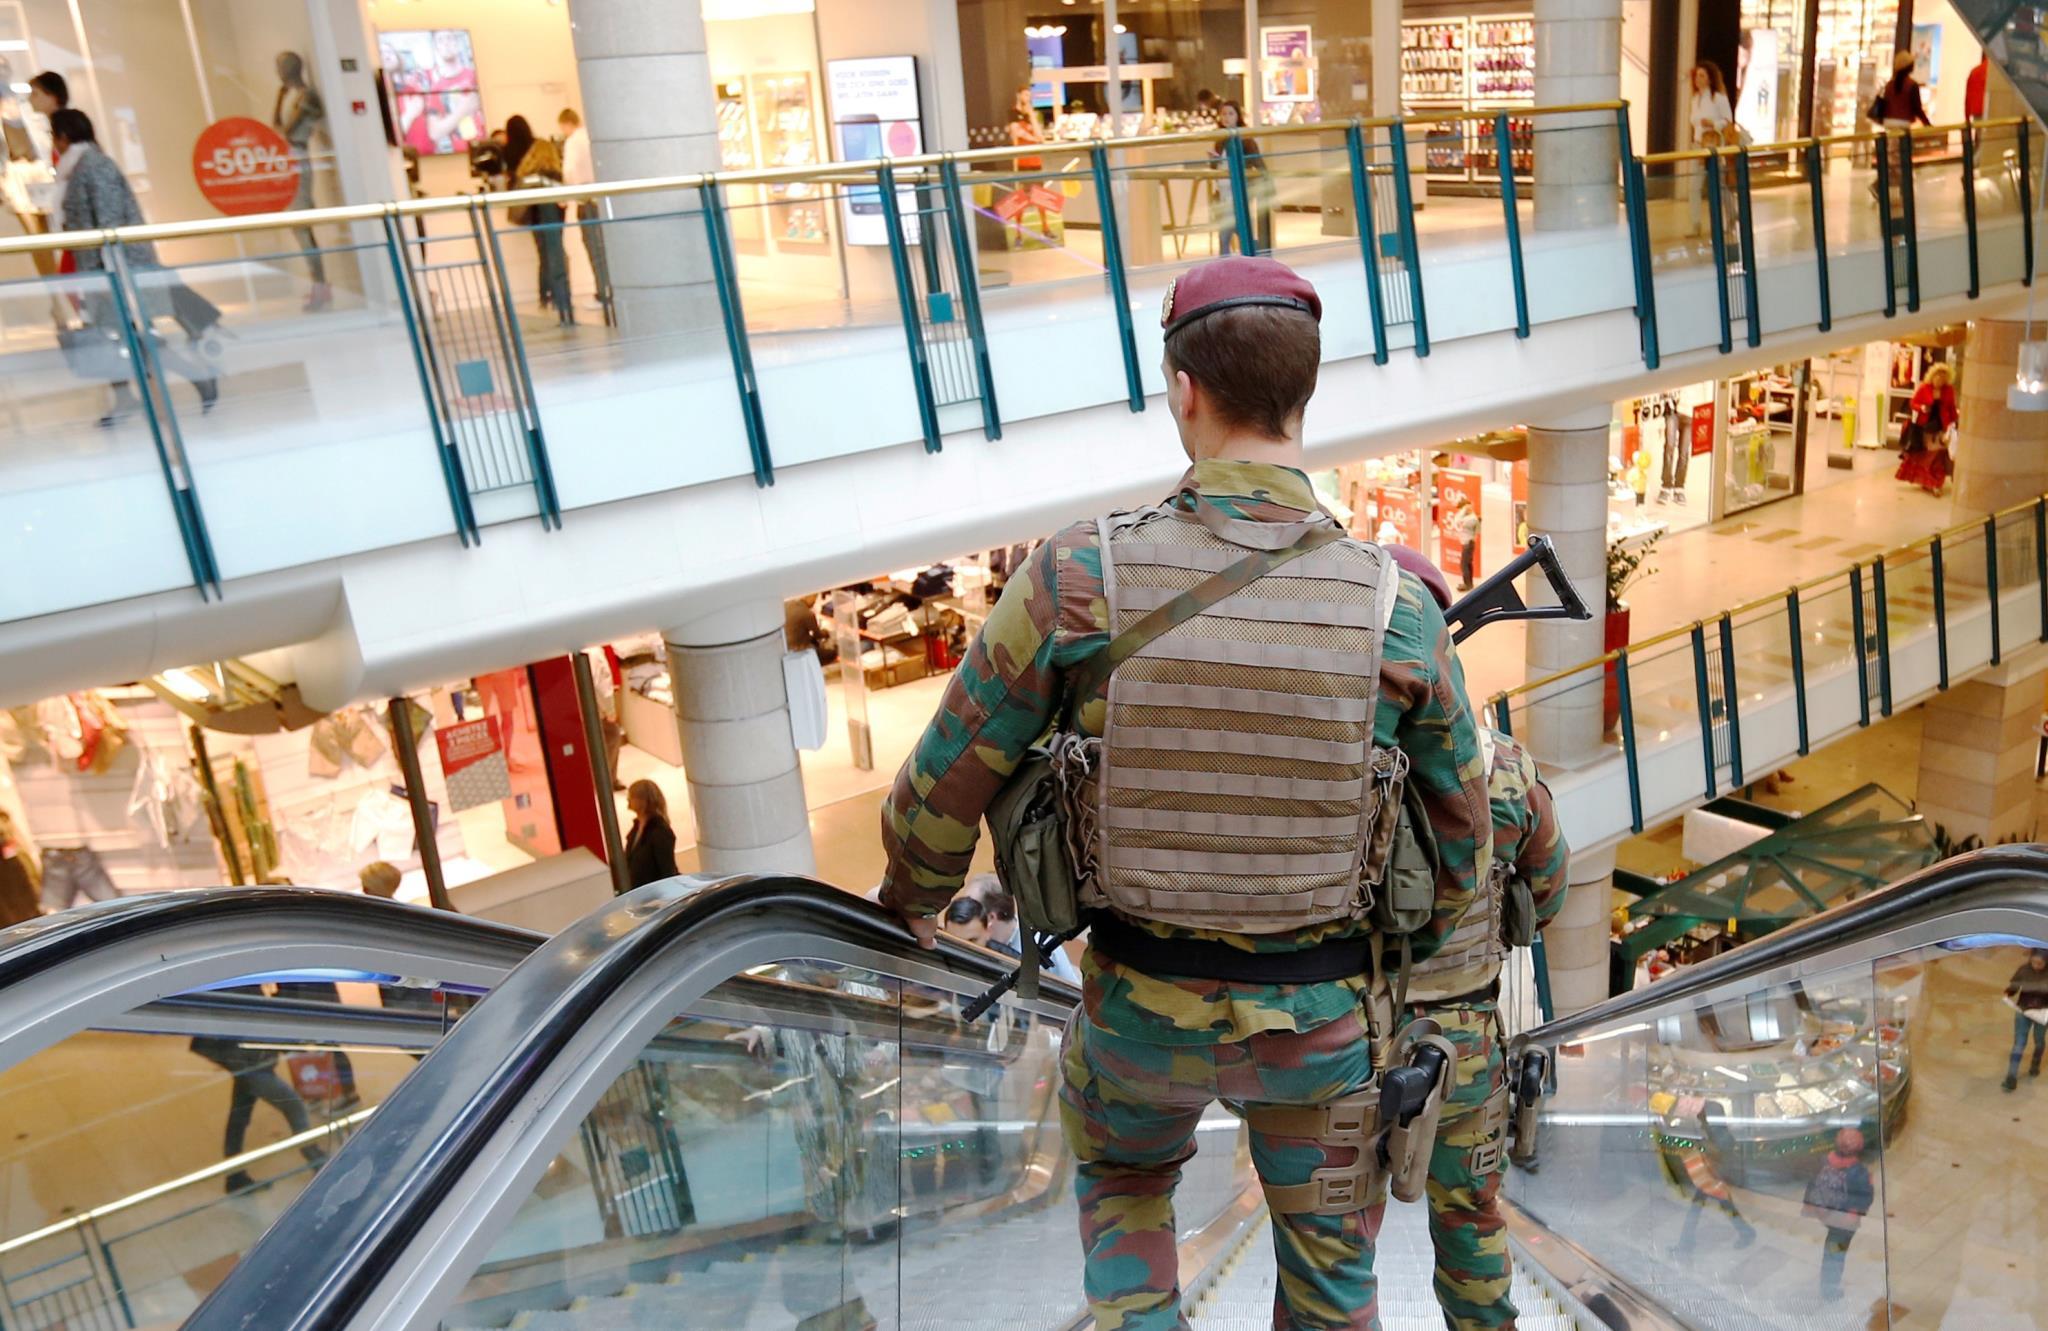 Operación policial en Bruselas